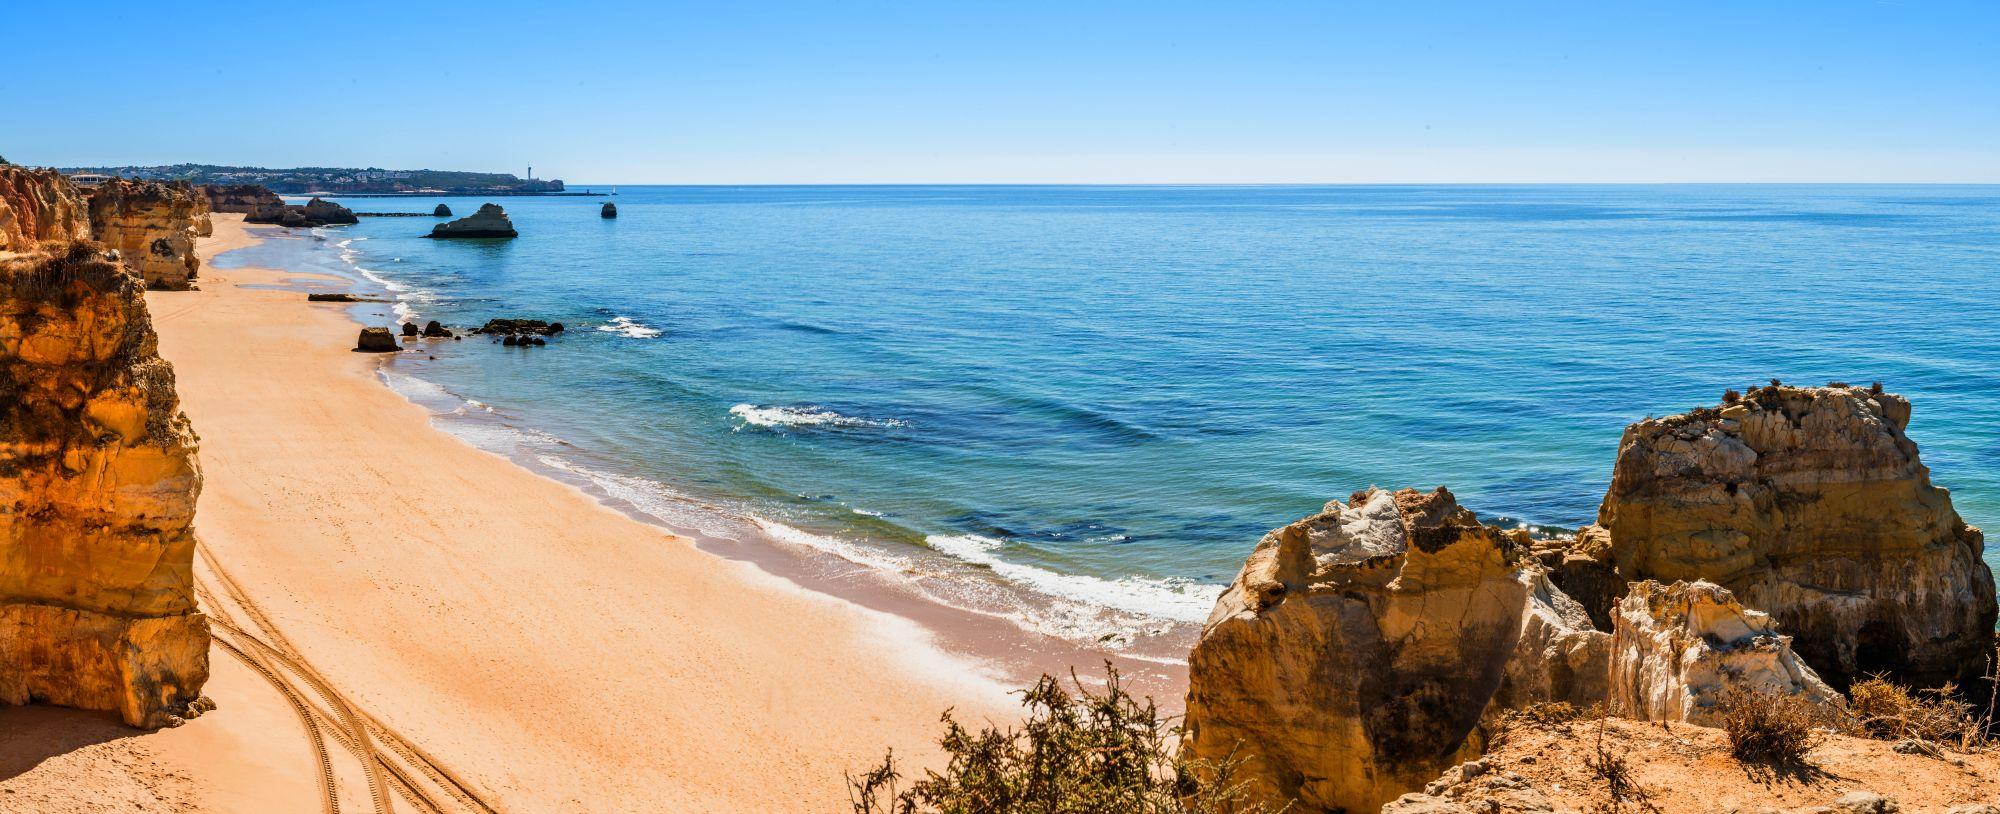 Praia do Rocha, Portugalia